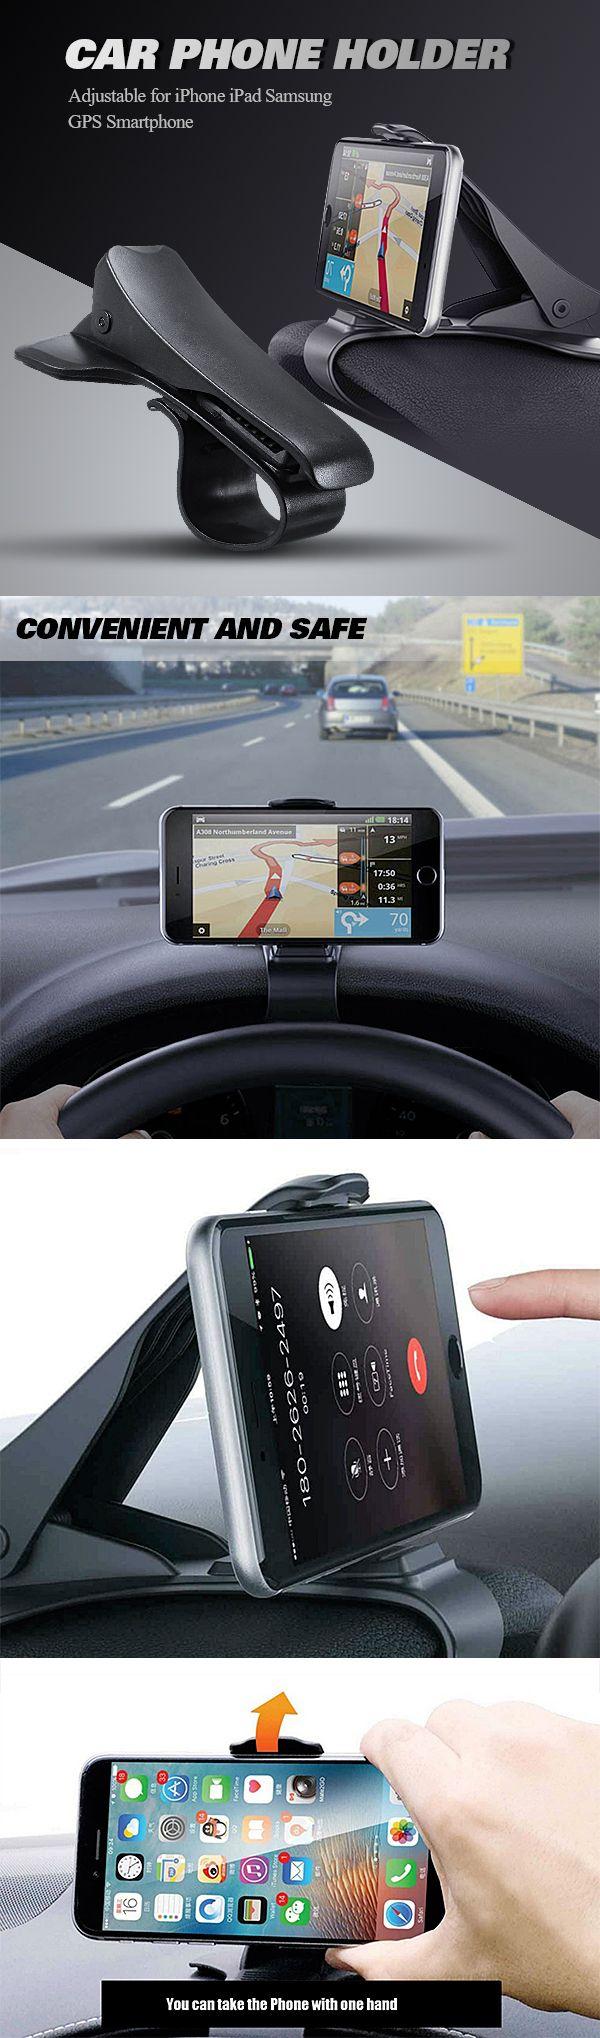 Bakeey atl 1 universal non slip dashboard car mount holder adjustable for iphone ipad samsung gps smartphone